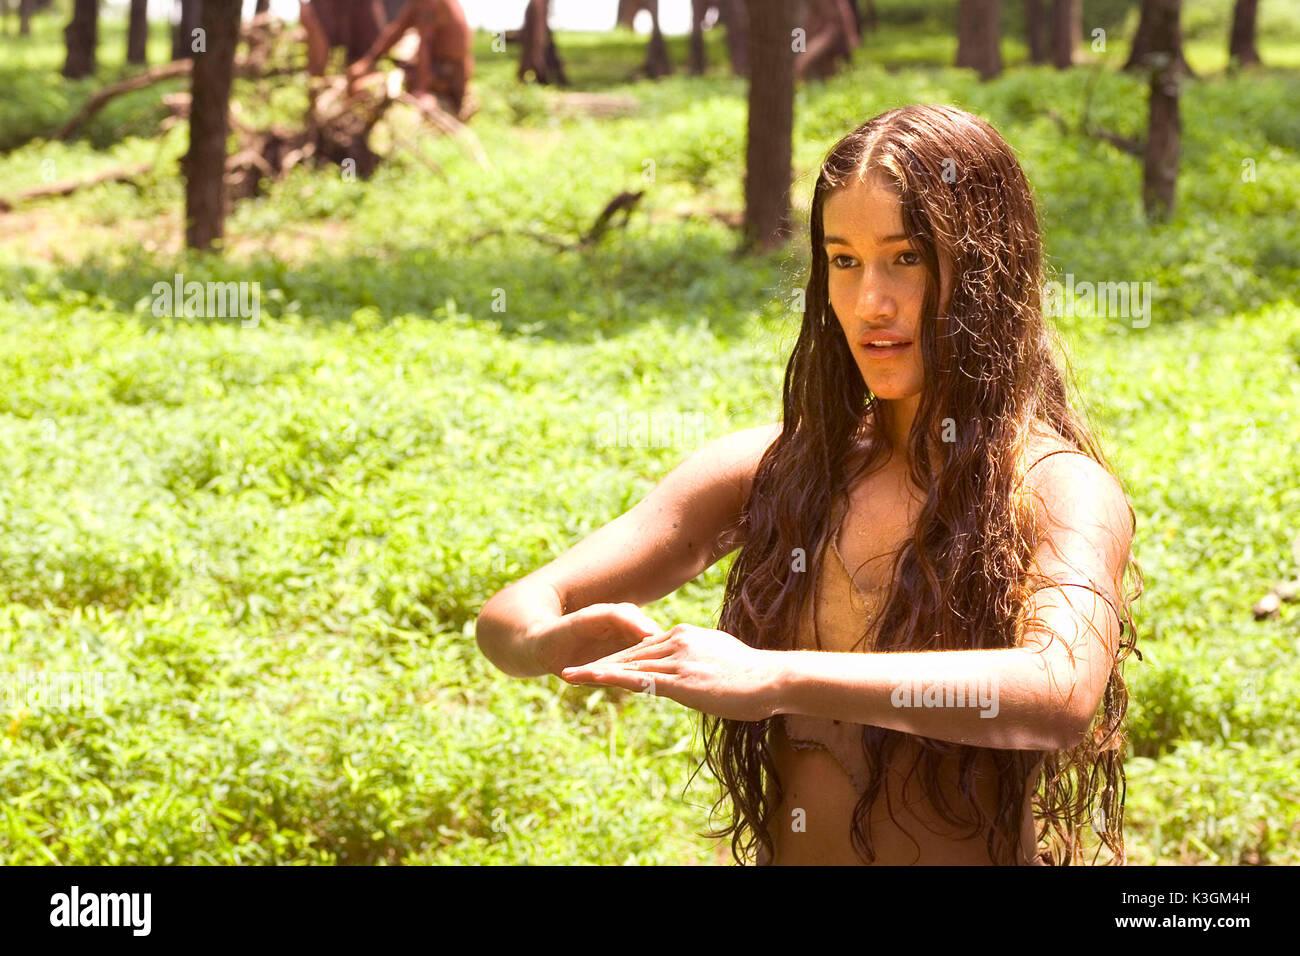 Qorianka Kilcher as Pocahontas in The New World (2006